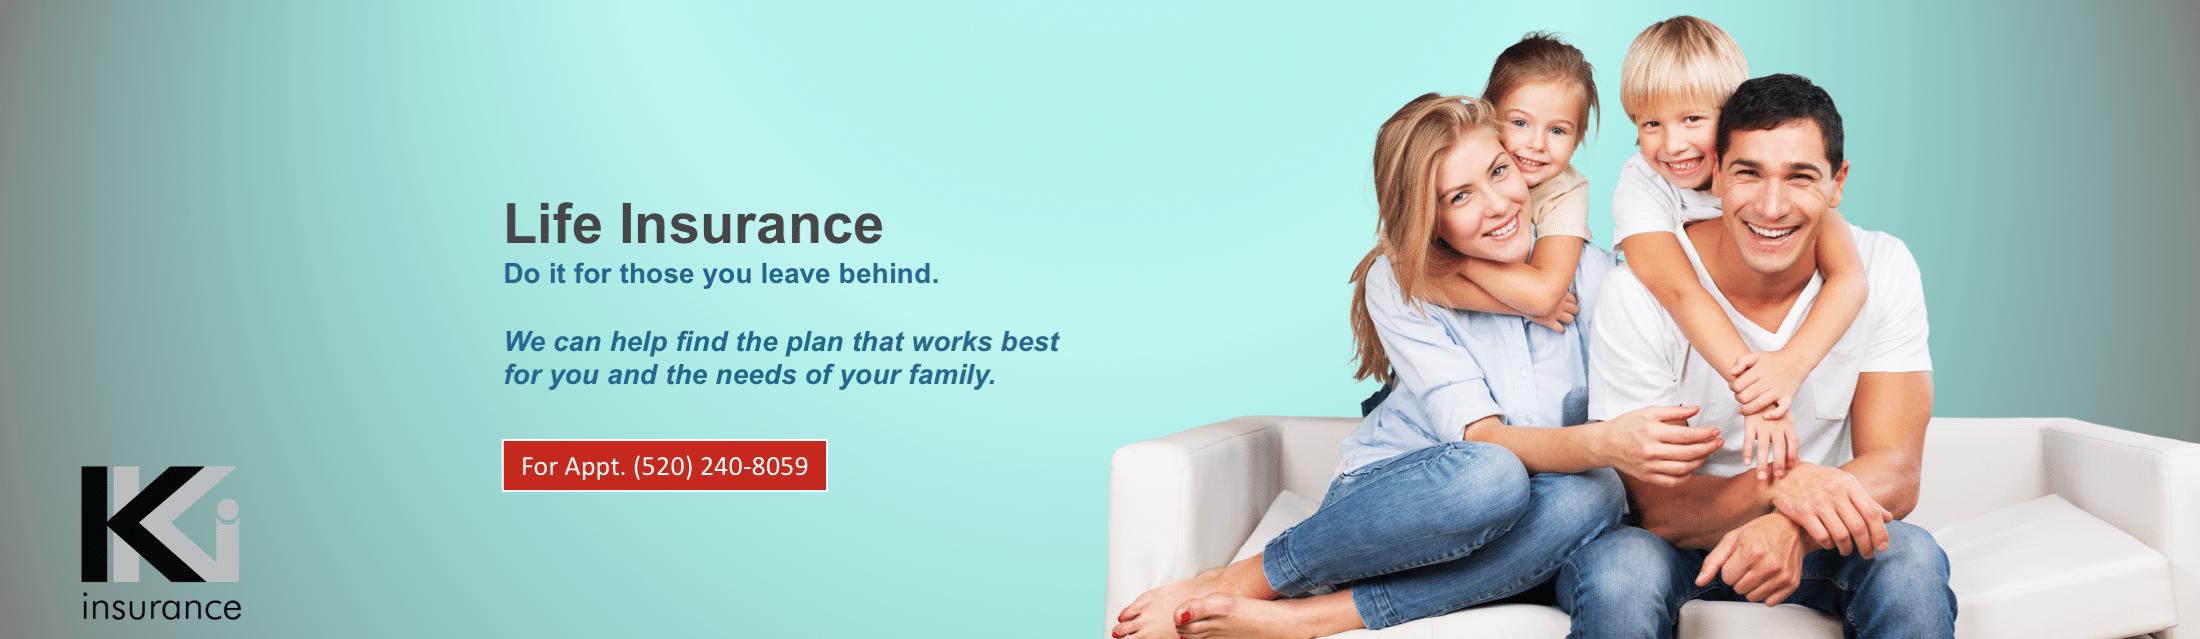 https://kimkraftinsurance.com/wp-content/uploads/2017/02/Health-Insurance-AZ-Kim-Kraft-Insurance.png